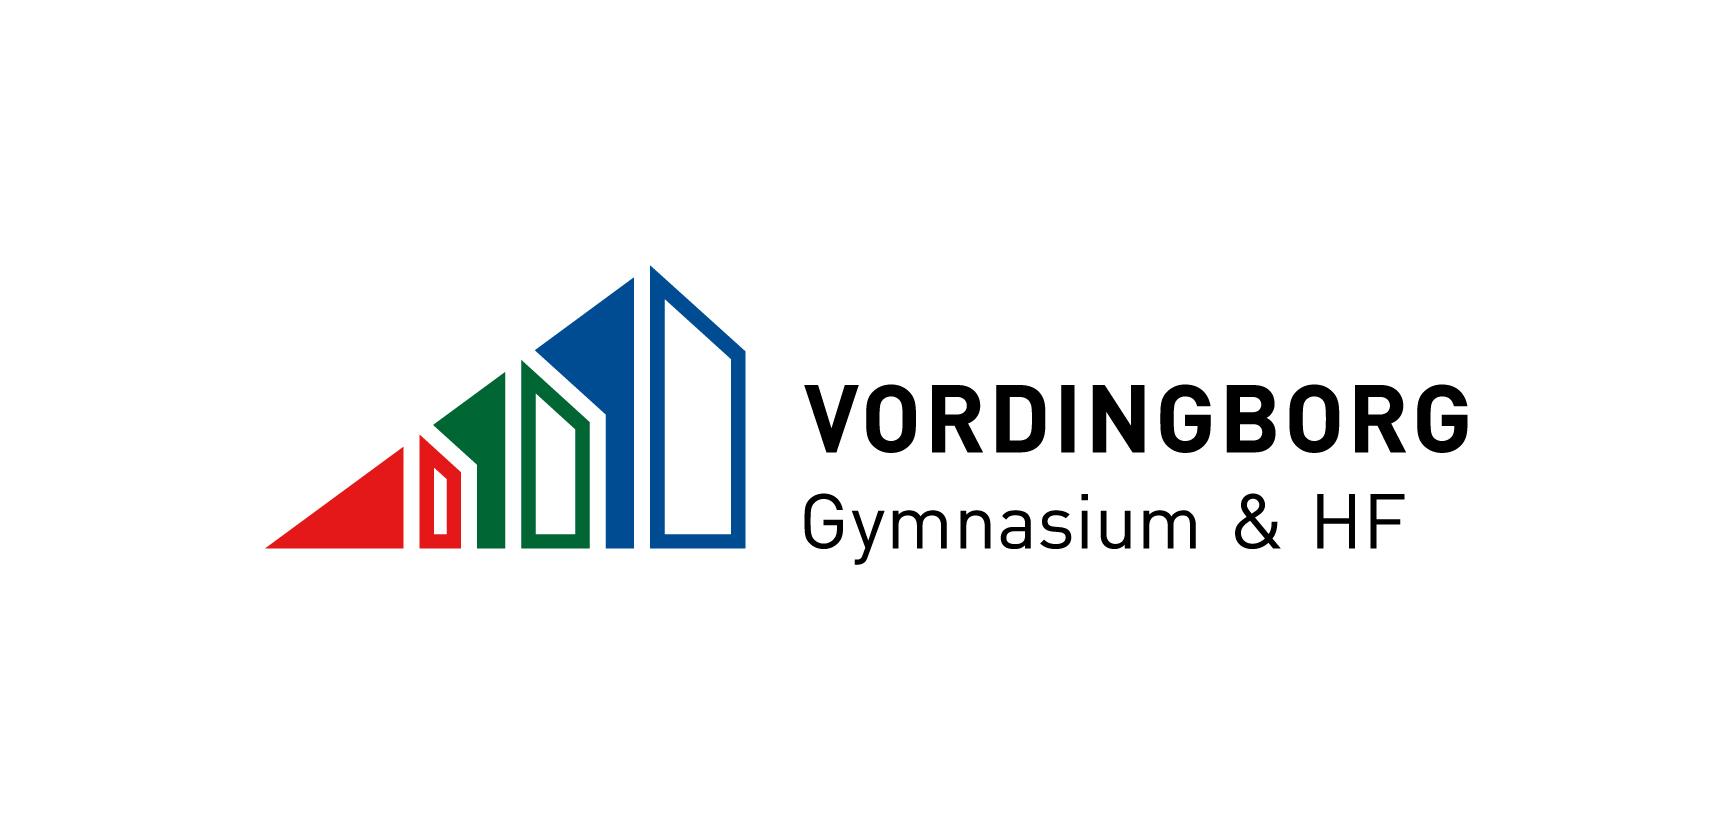 Vordingborg Gymnasium & HF